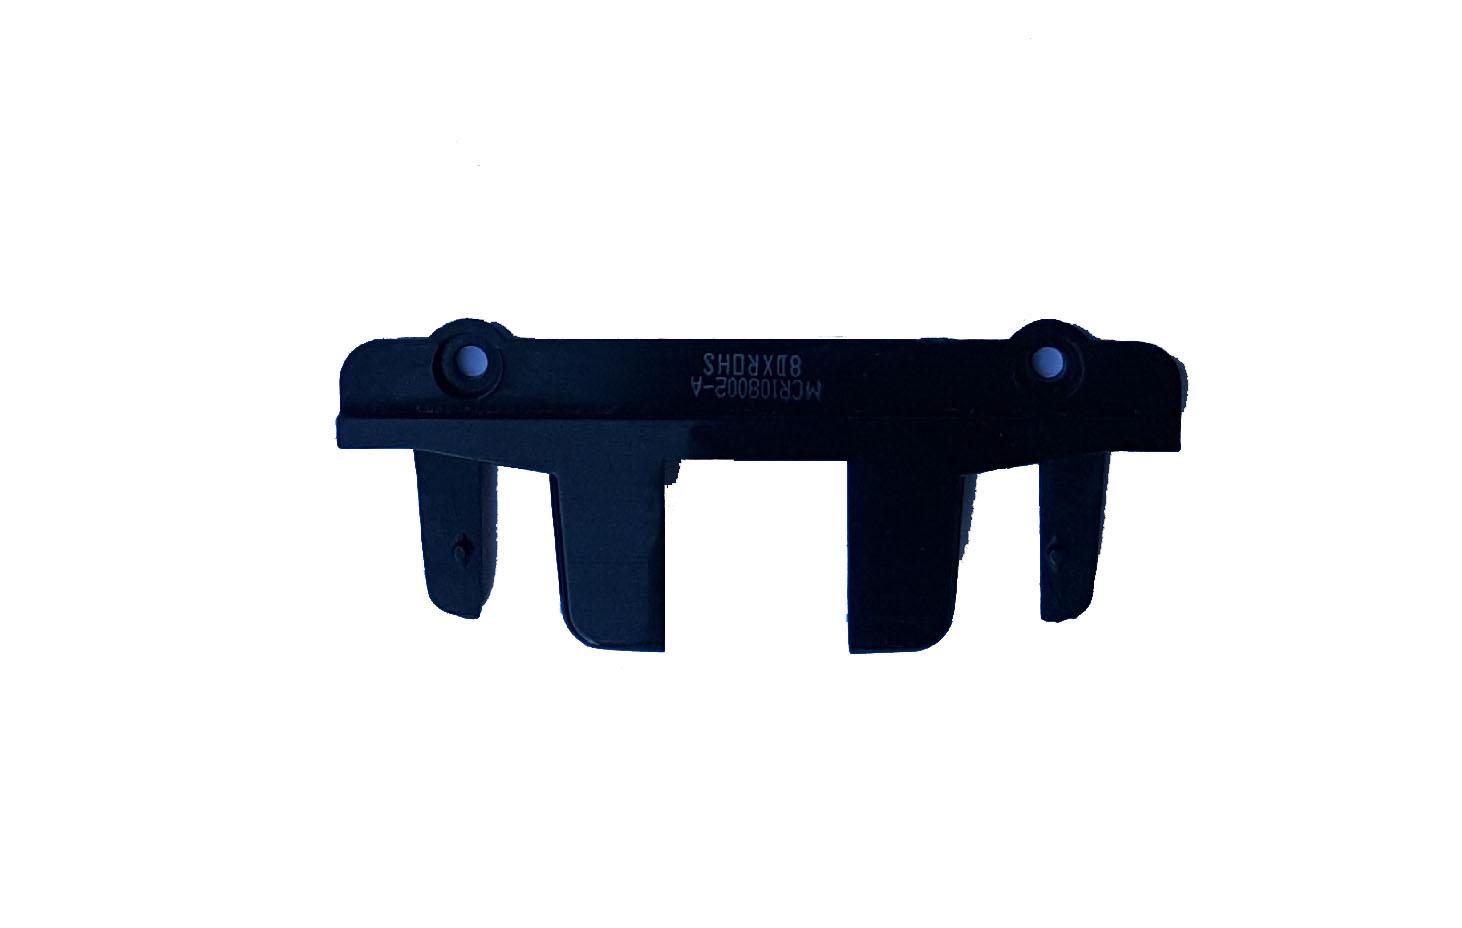 Suporte do Leitor Magnético Nurit 8400